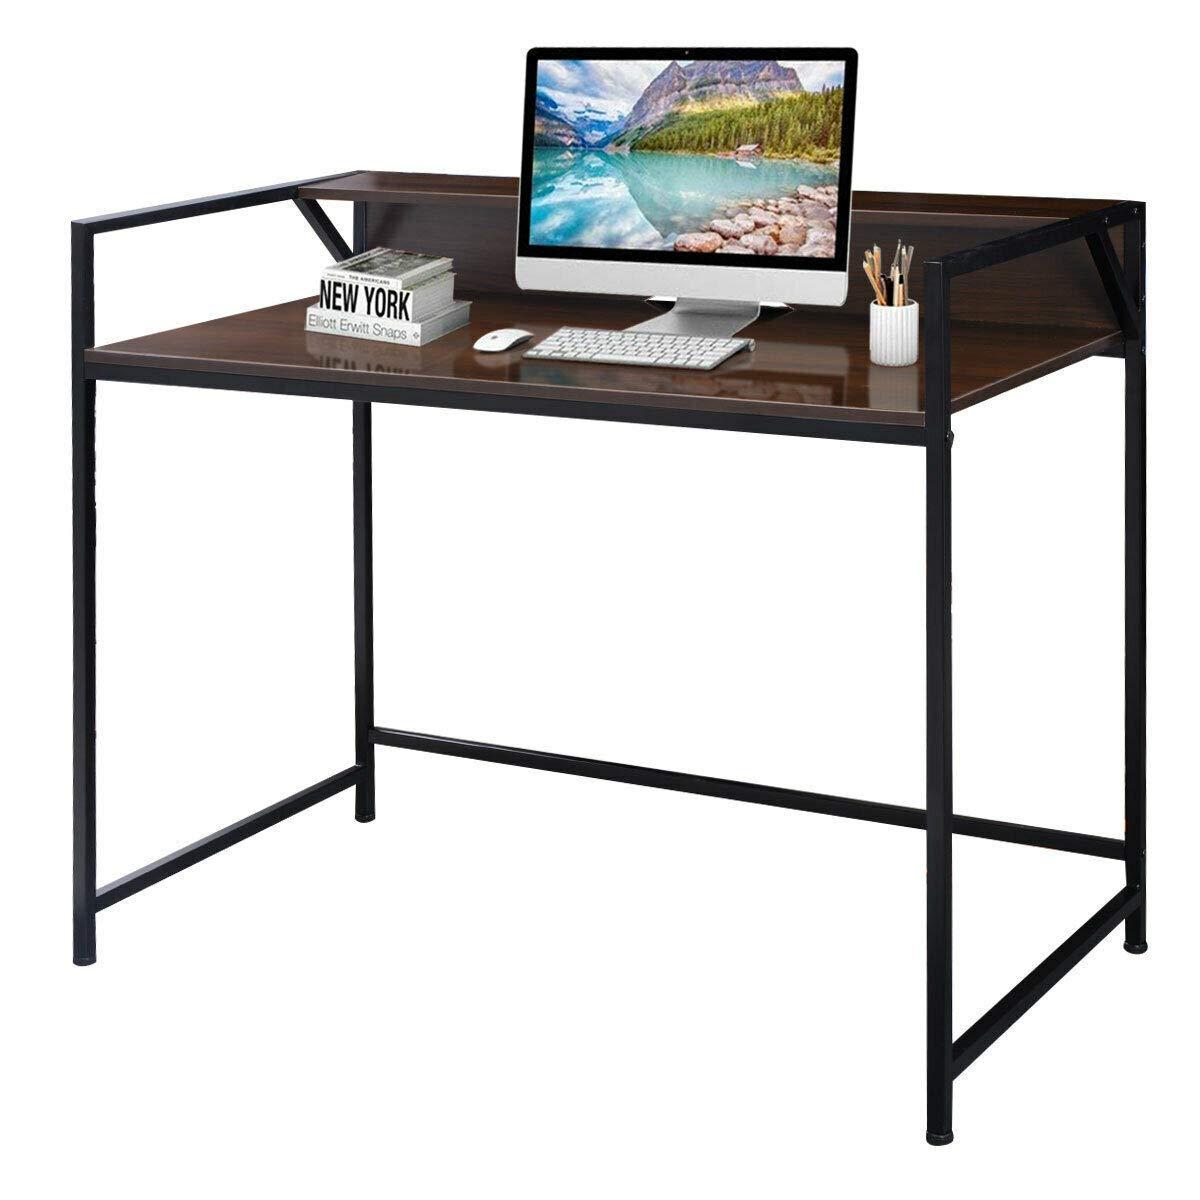 TANGKULA Computer Desk Laptop Writing Desk Student Study Desk Modern Simple Style Home Office Desk Large Size PC Laptop Study Table Workstation Writing Desk for Home and Office (Brown and Black)